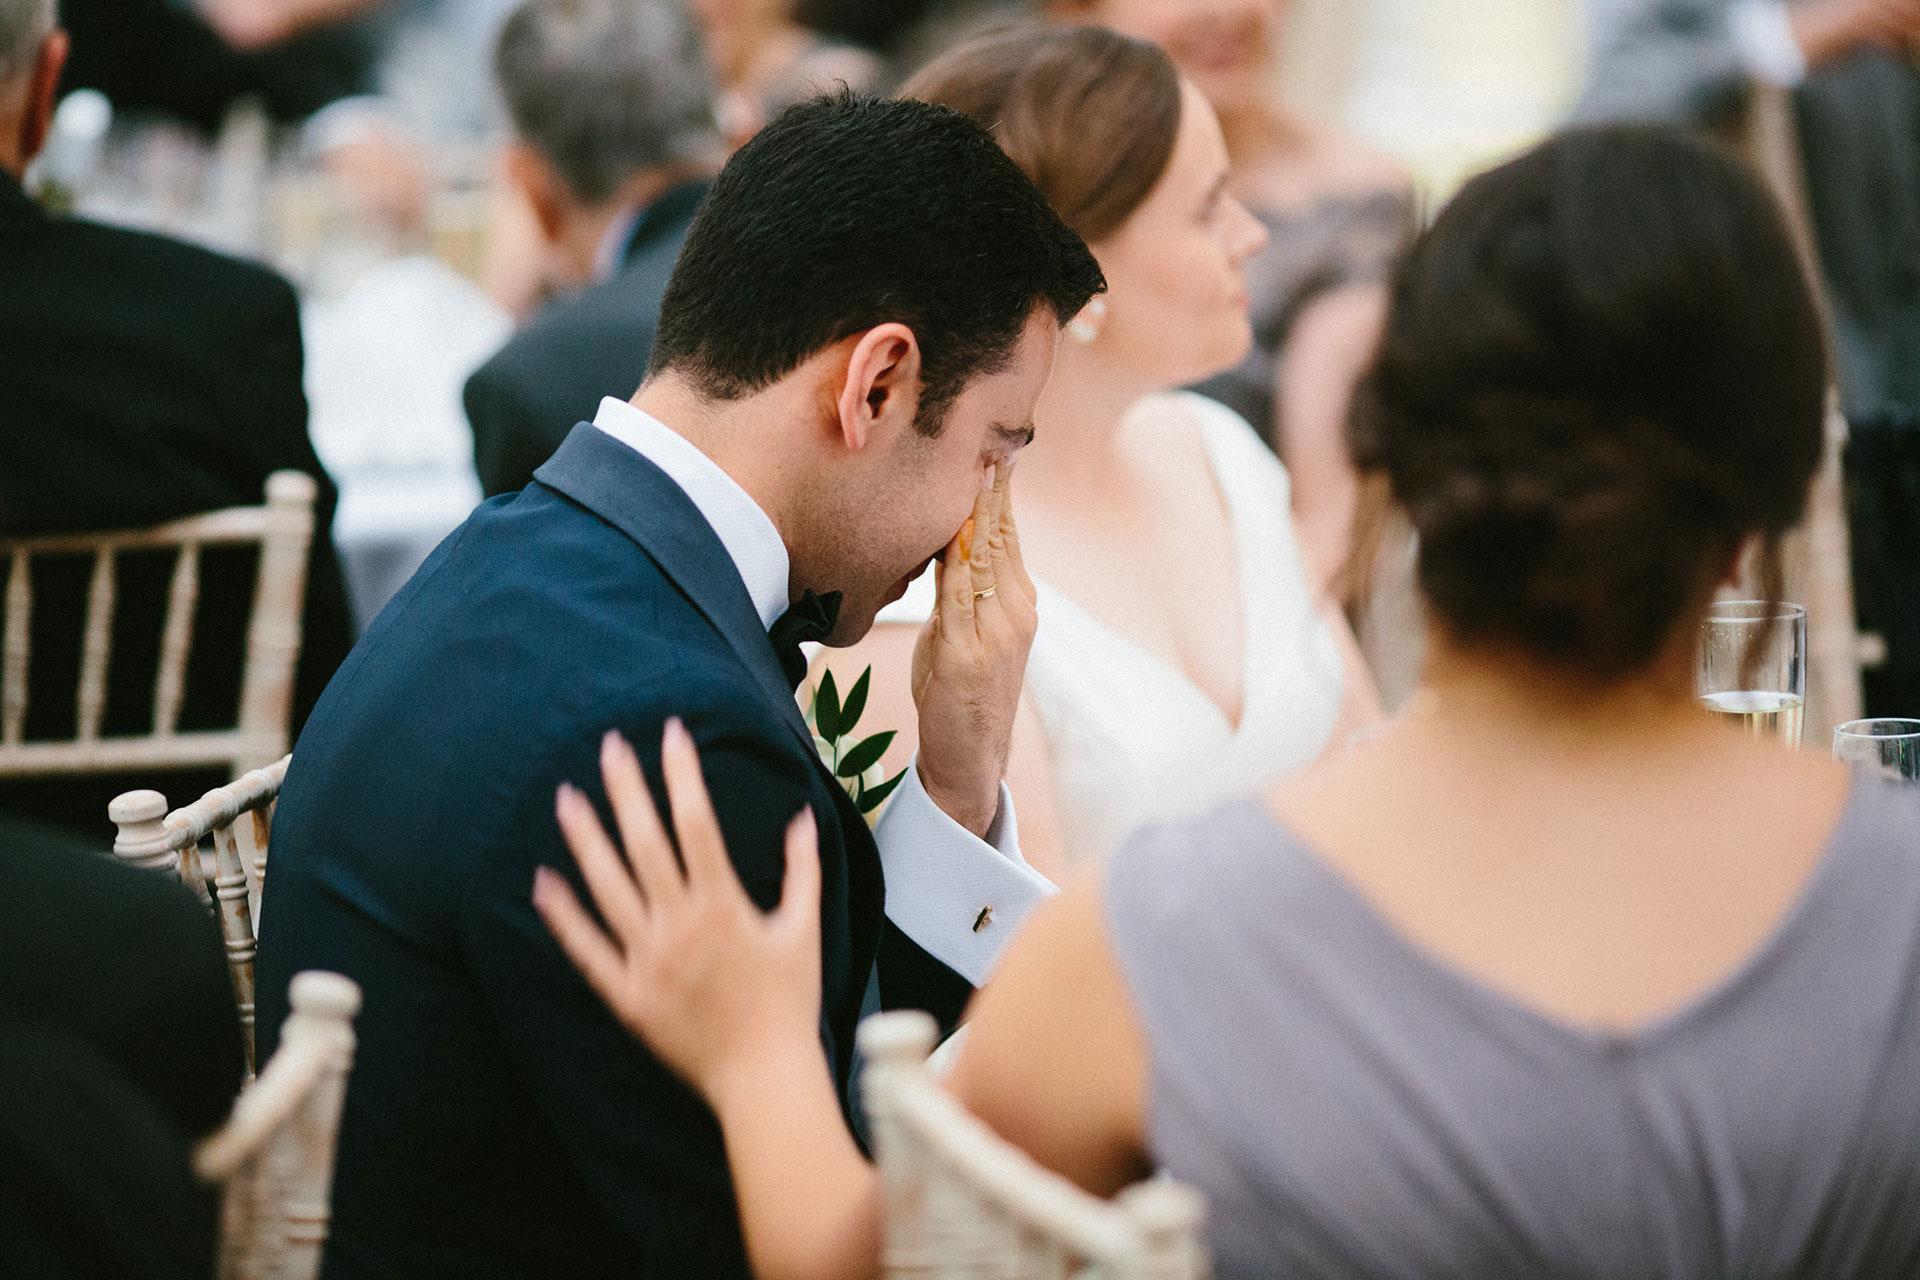 Syon-Park-Wedding-Photographer--_-Michael-Newington-Gray-740.jpg